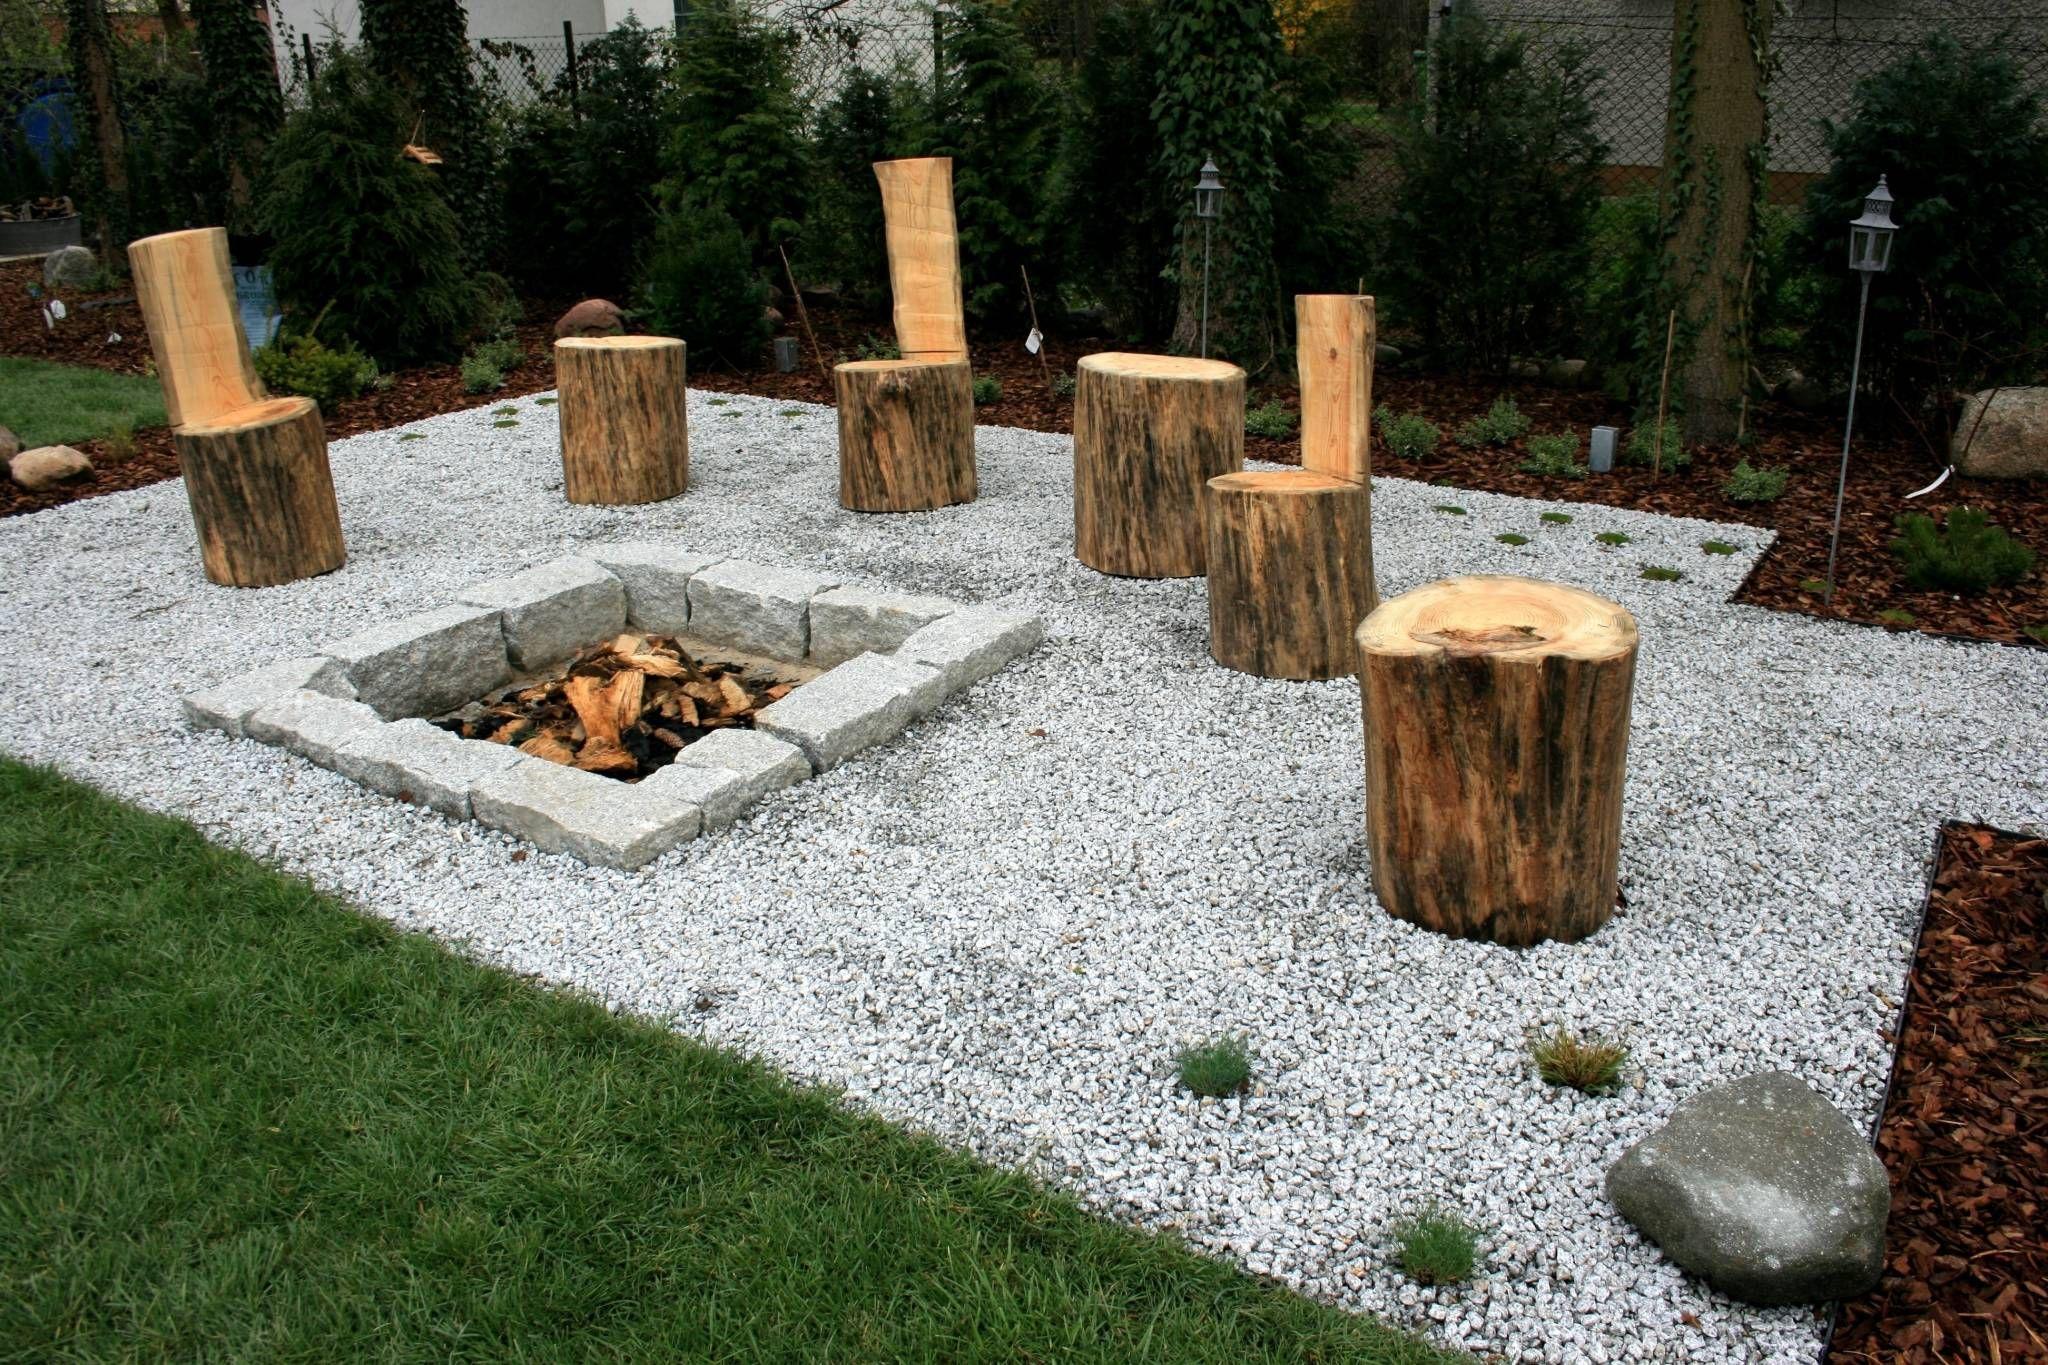 ogr d naturalistyczny z miejscem na ognisko od ogrodowa. Black Bedroom Furniture Sets. Home Design Ideas